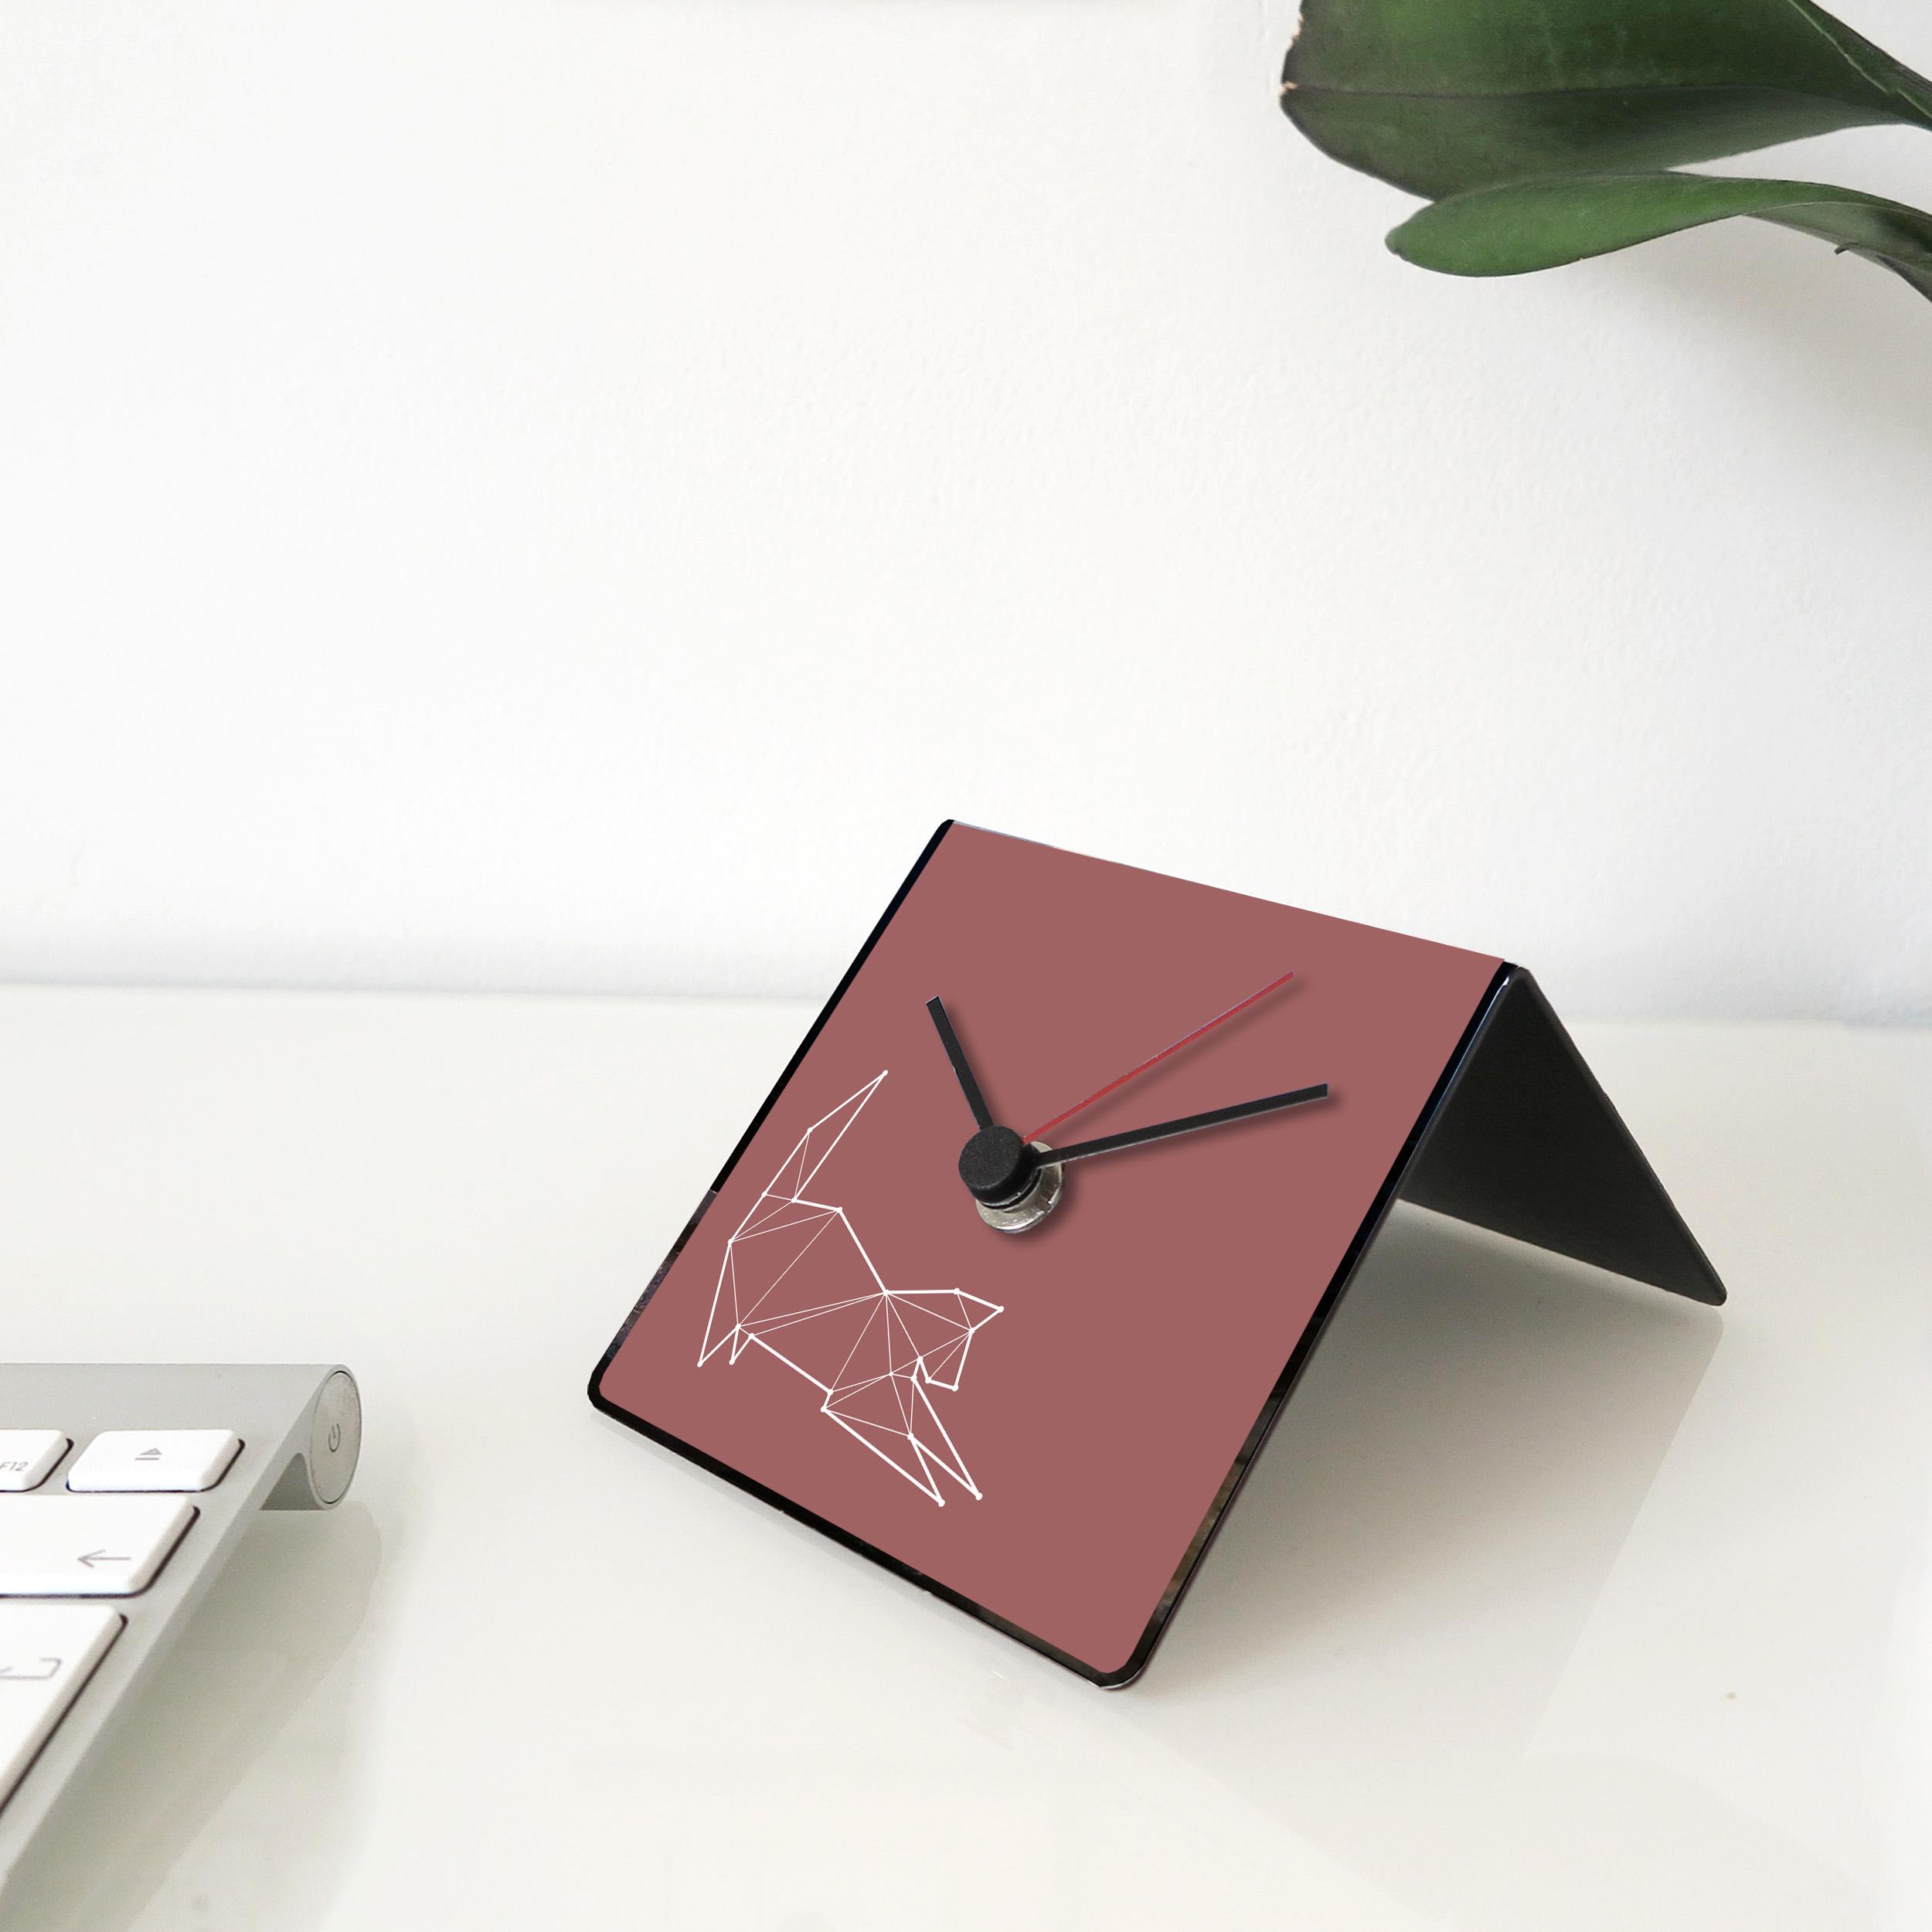 gatto-totem-design-clock-mood